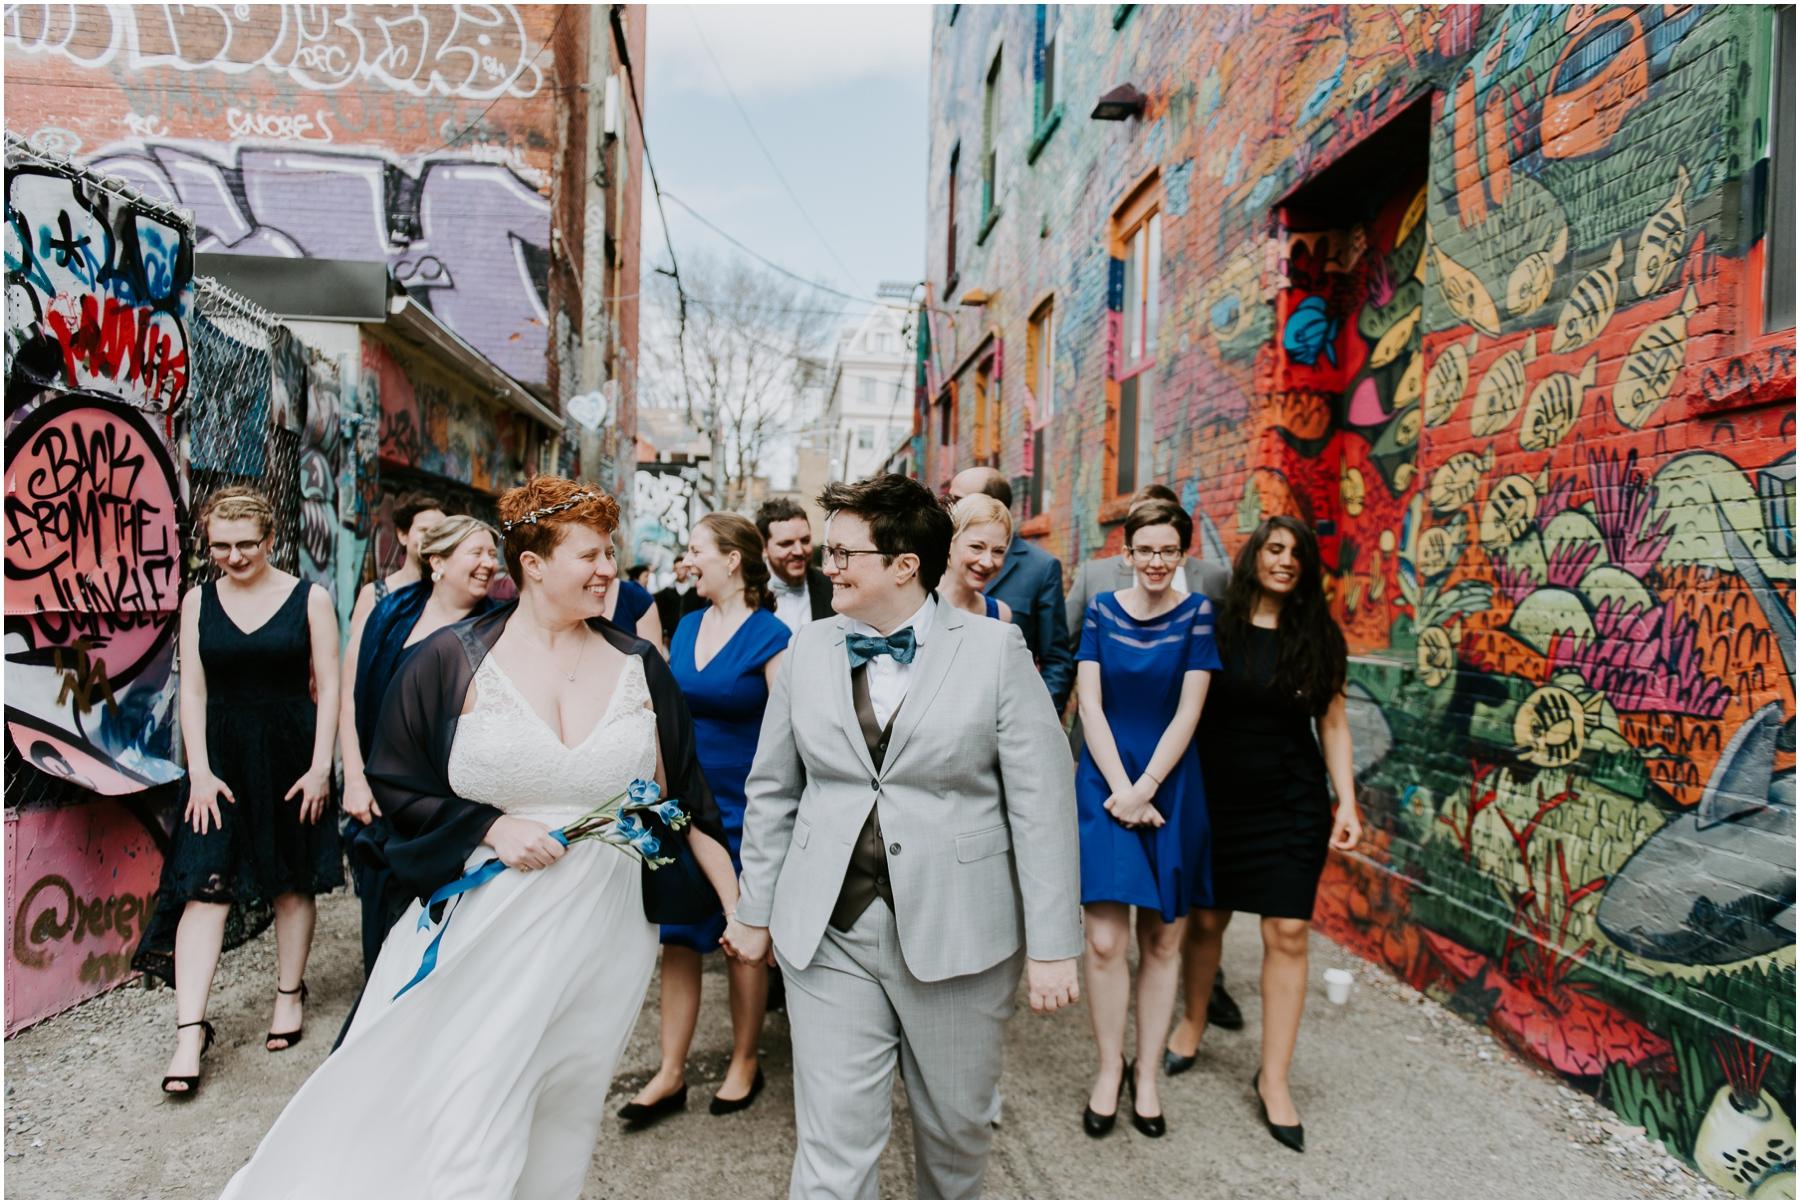 Grafitti Alley Queen W Toronto wedding party walking